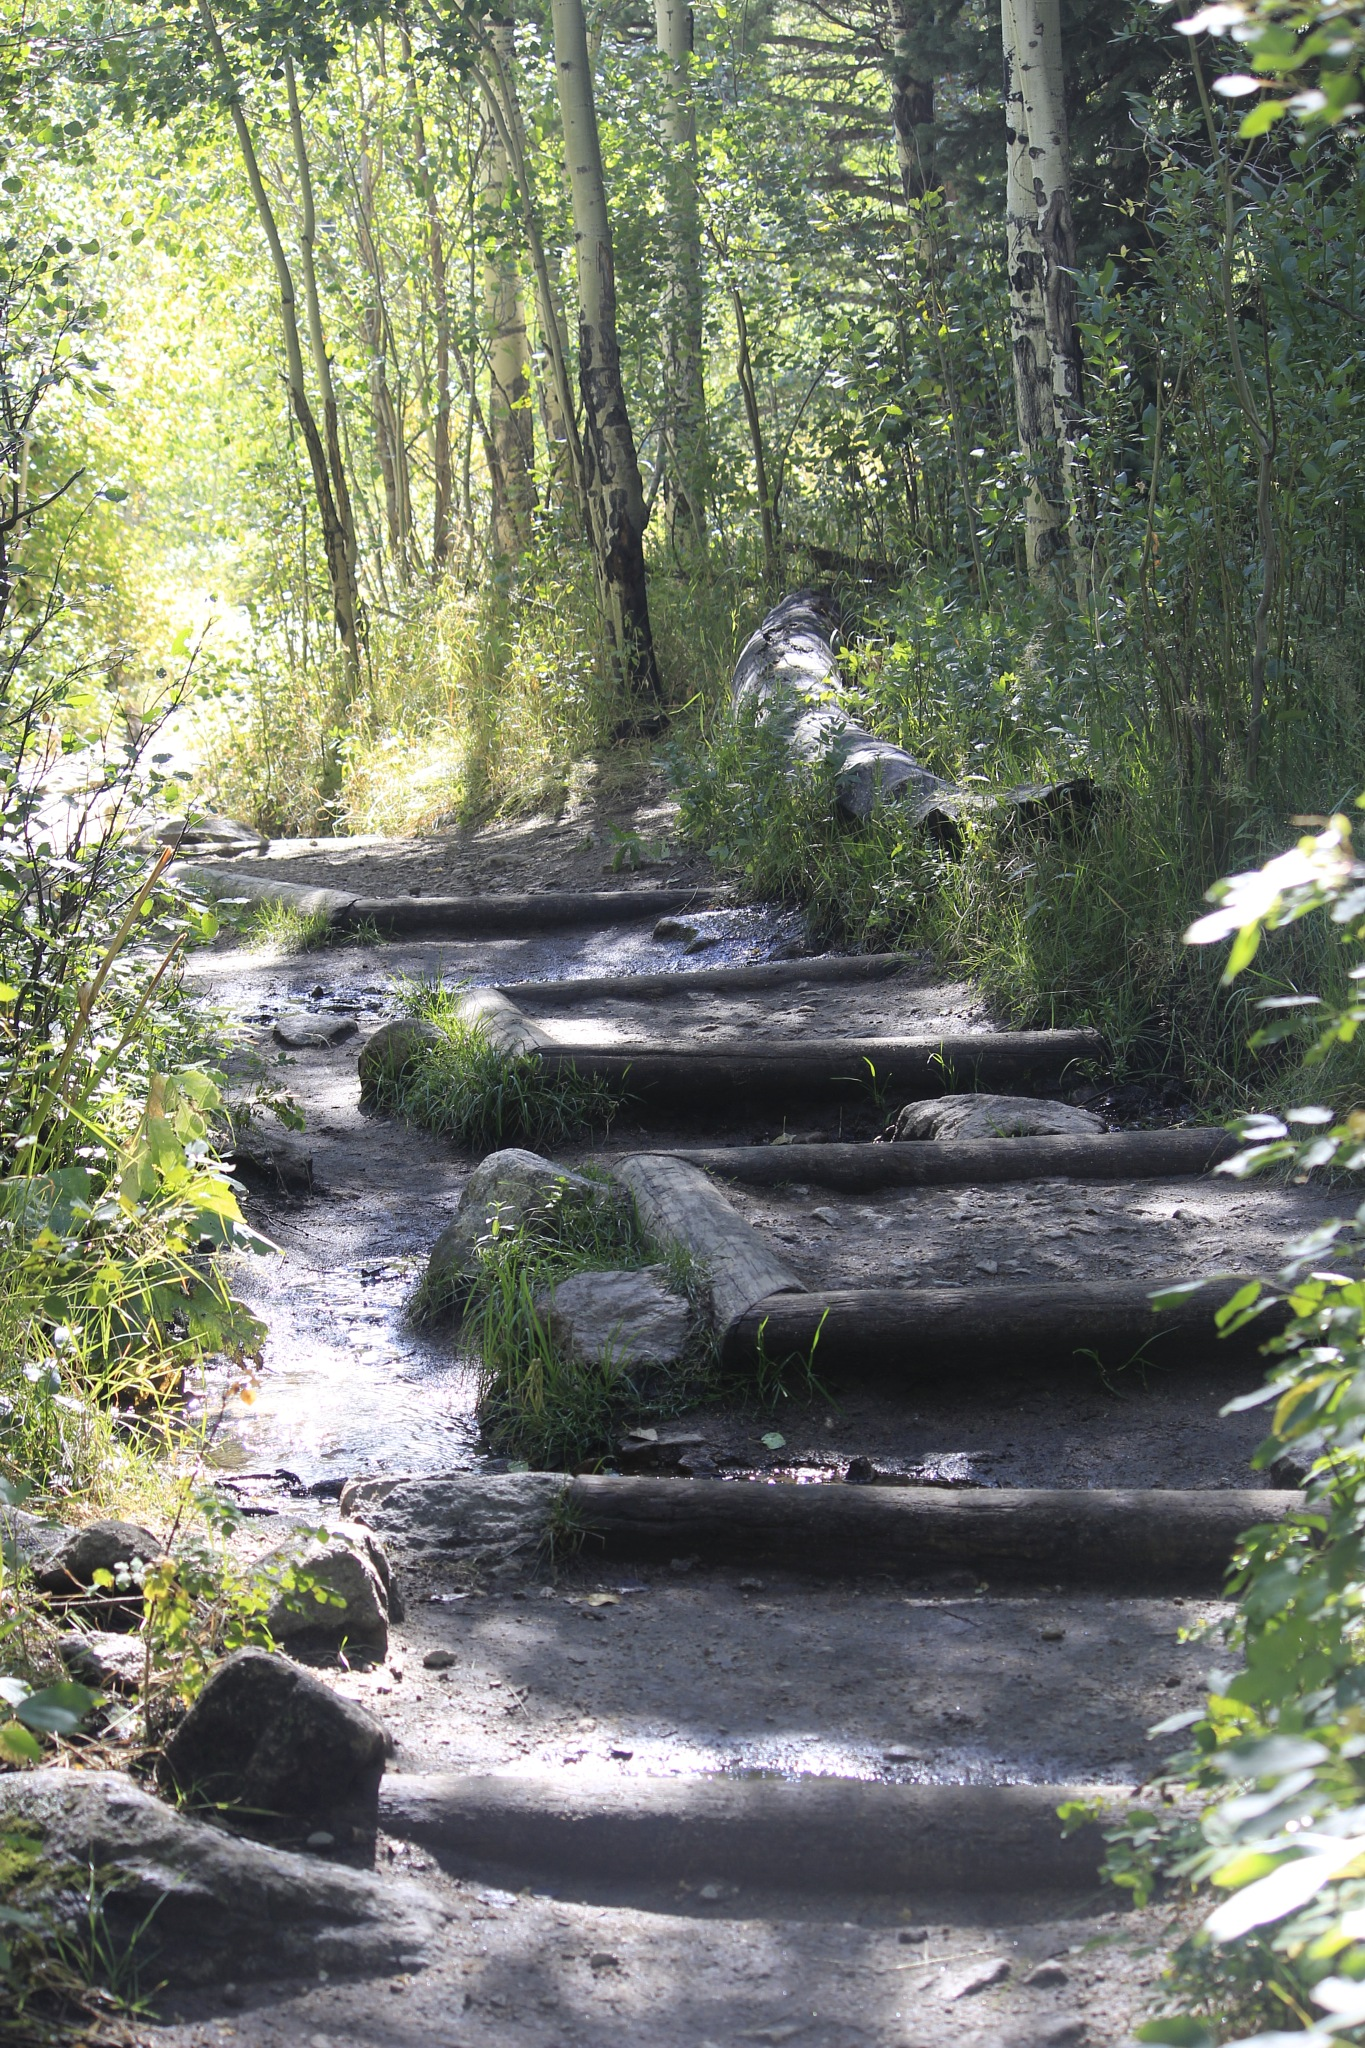 Stairway to My Kind of Heaven by Lynda Clayton